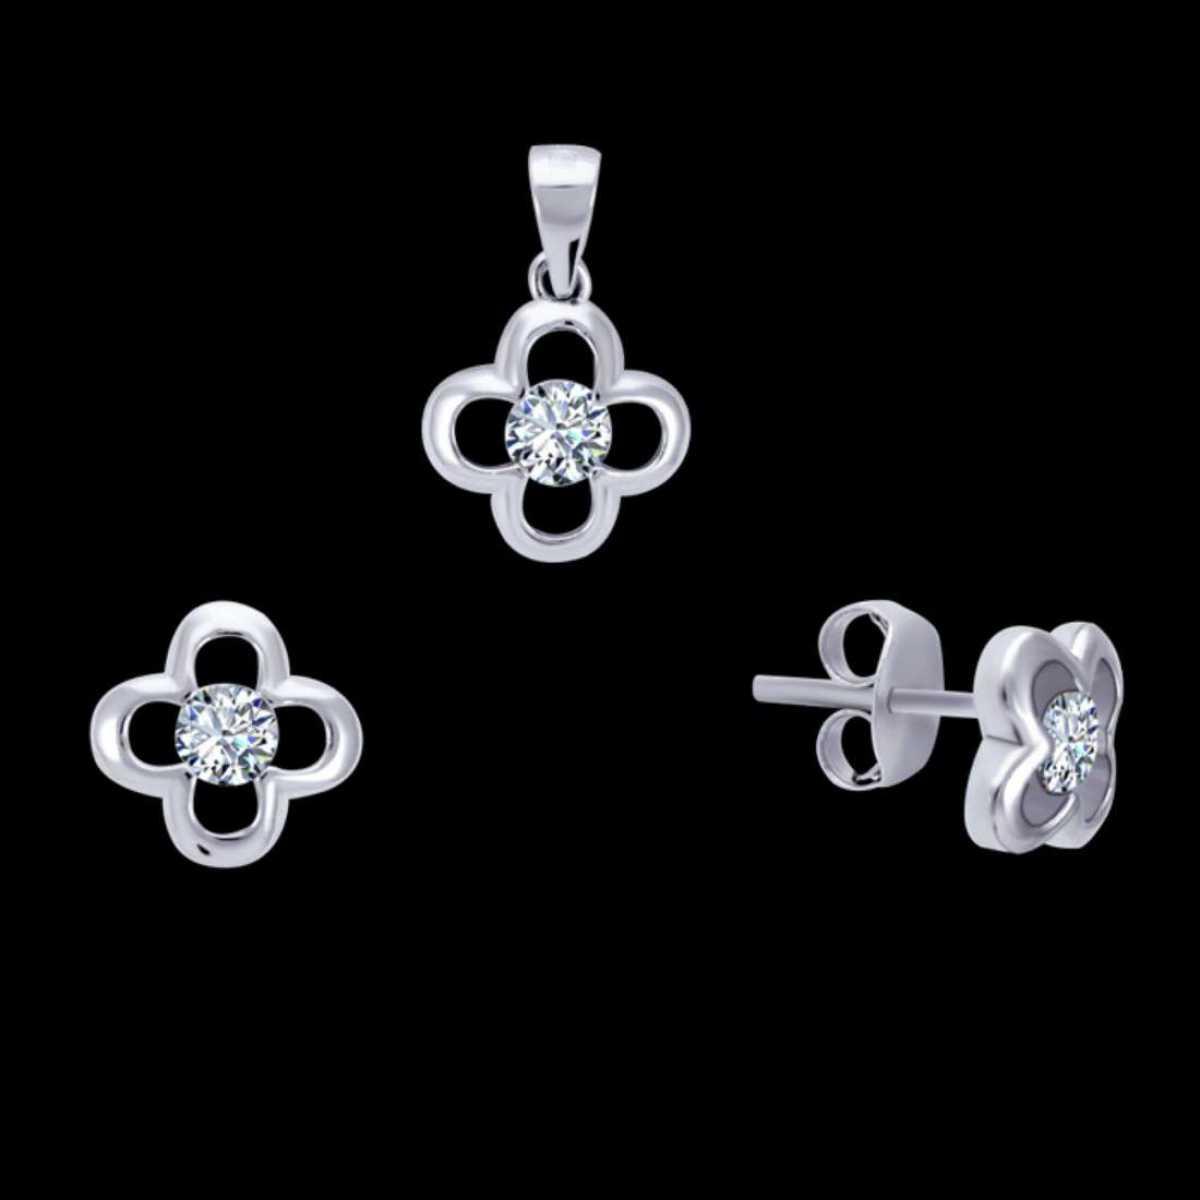 Sweet Flower Sterling Silver Pendant Set